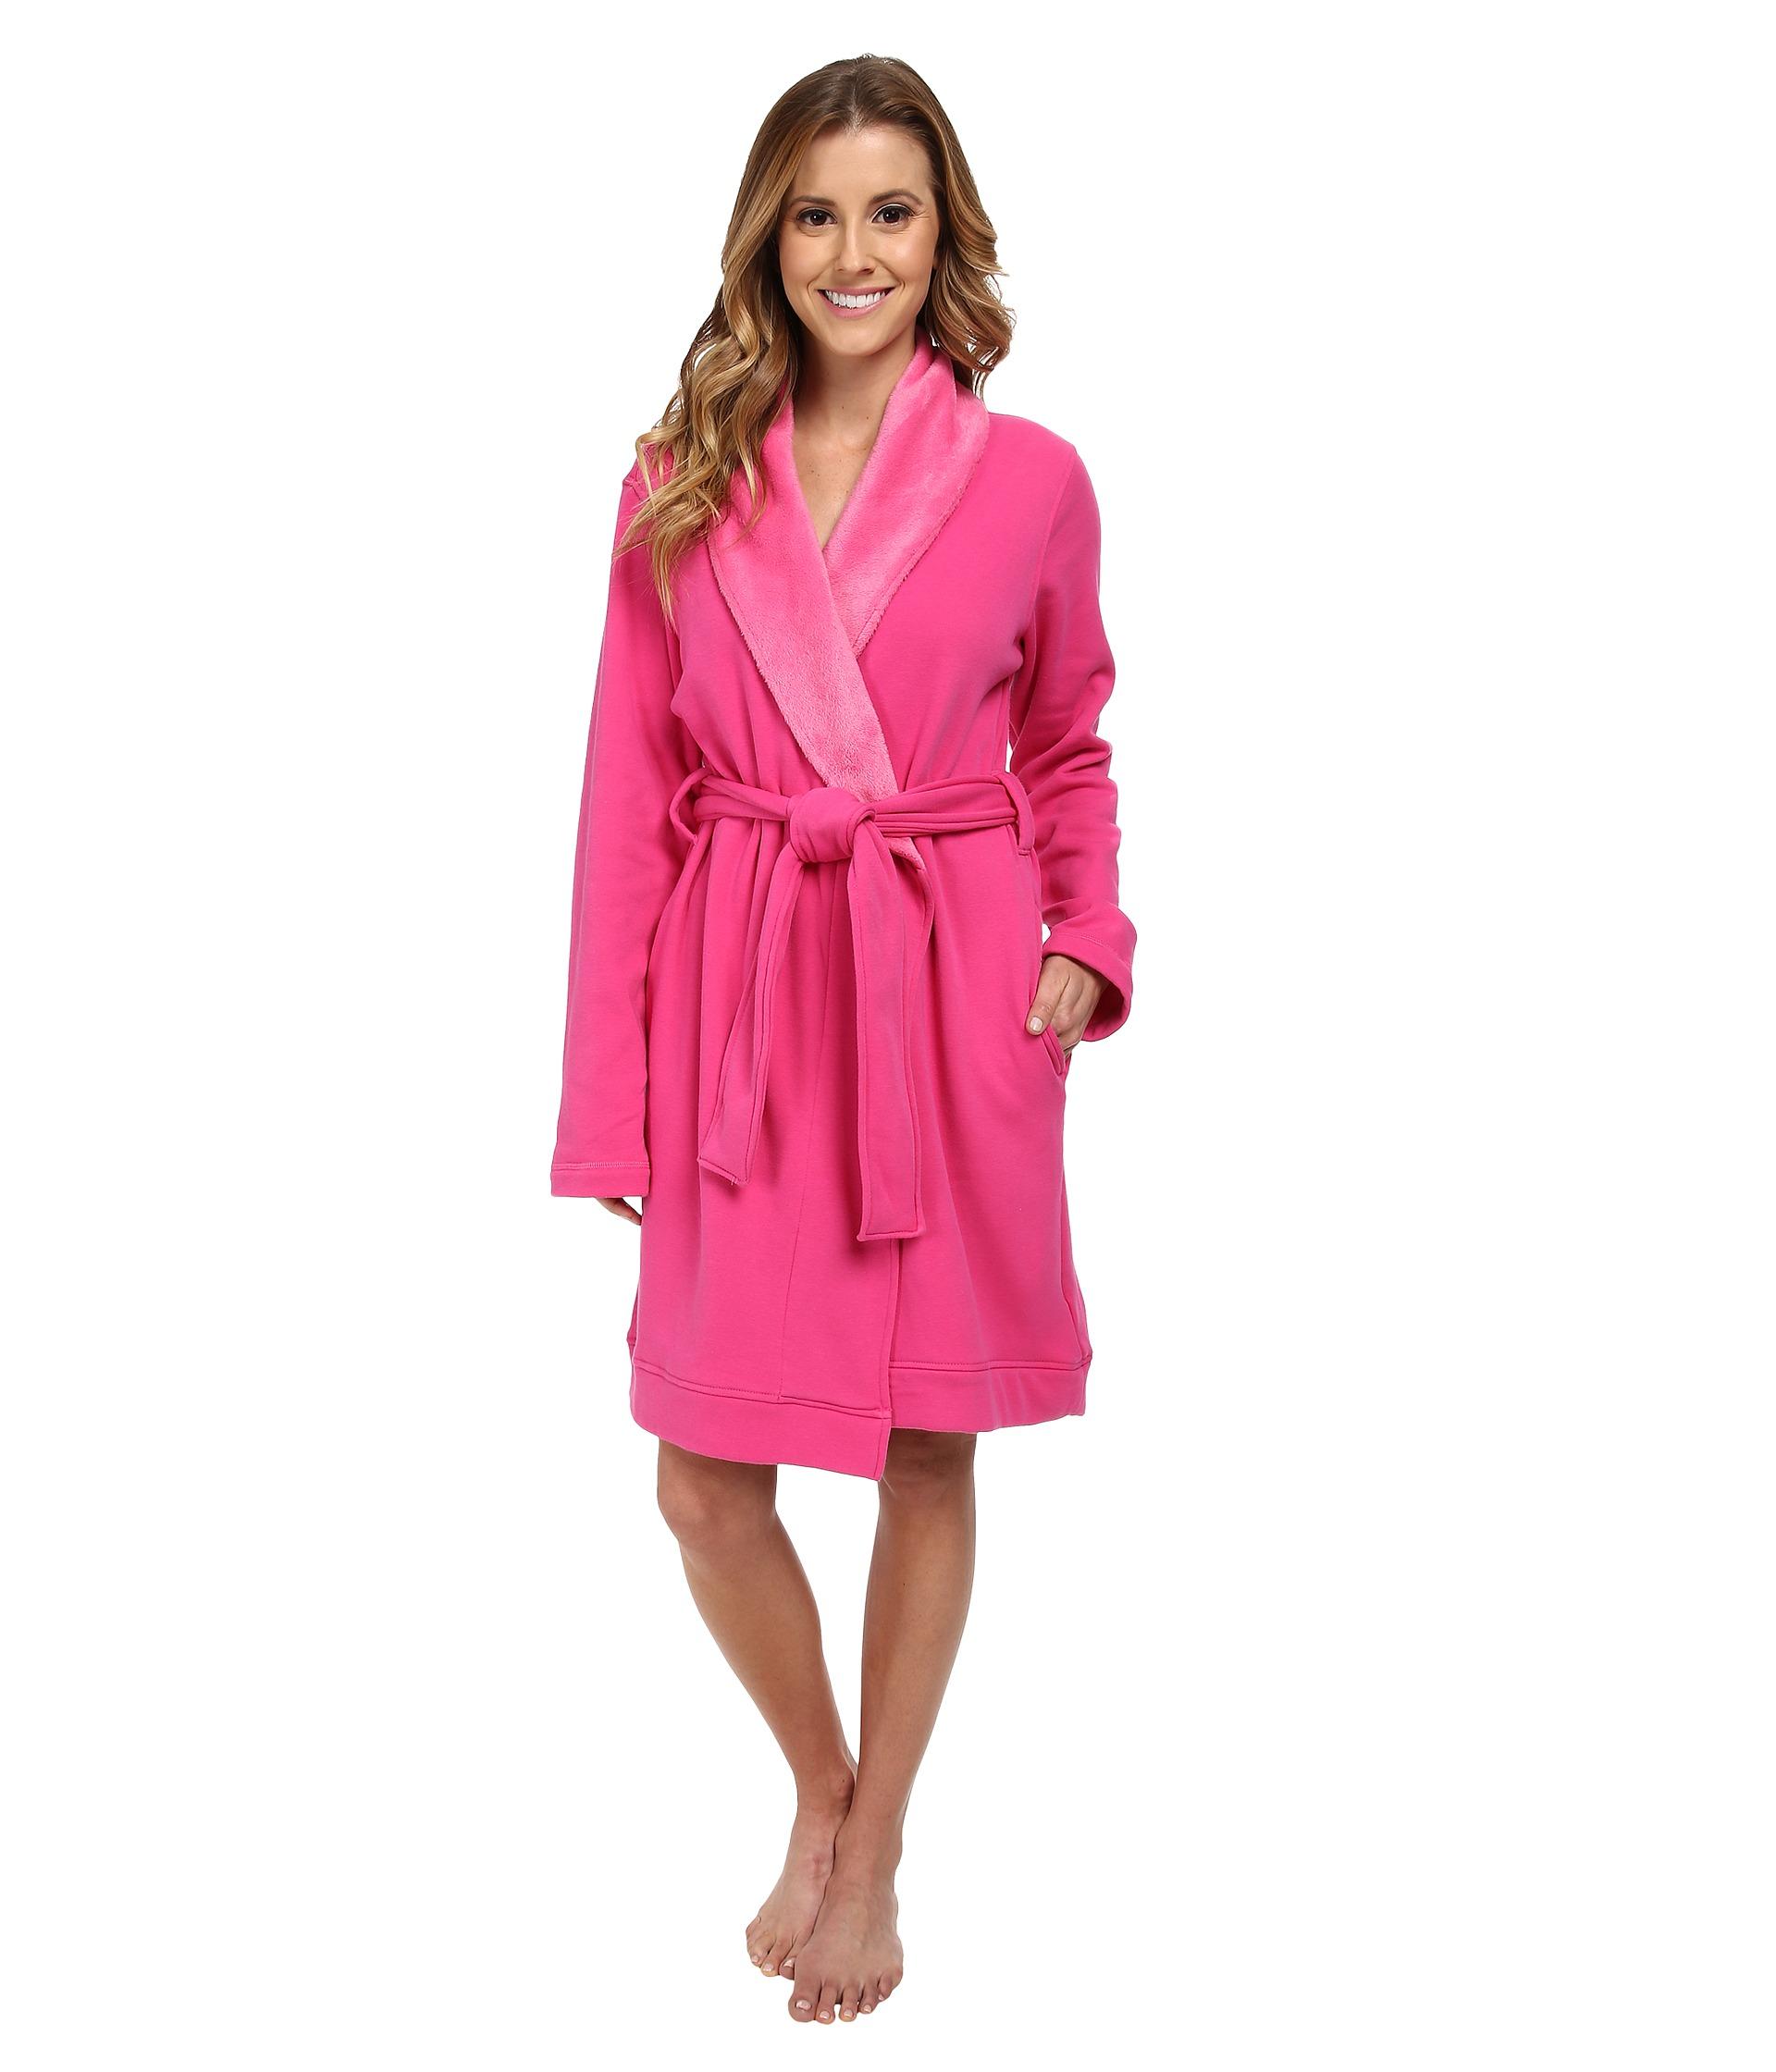 ugg blanche robe in pink lyst. Black Bedroom Furniture Sets. Home Design Ideas